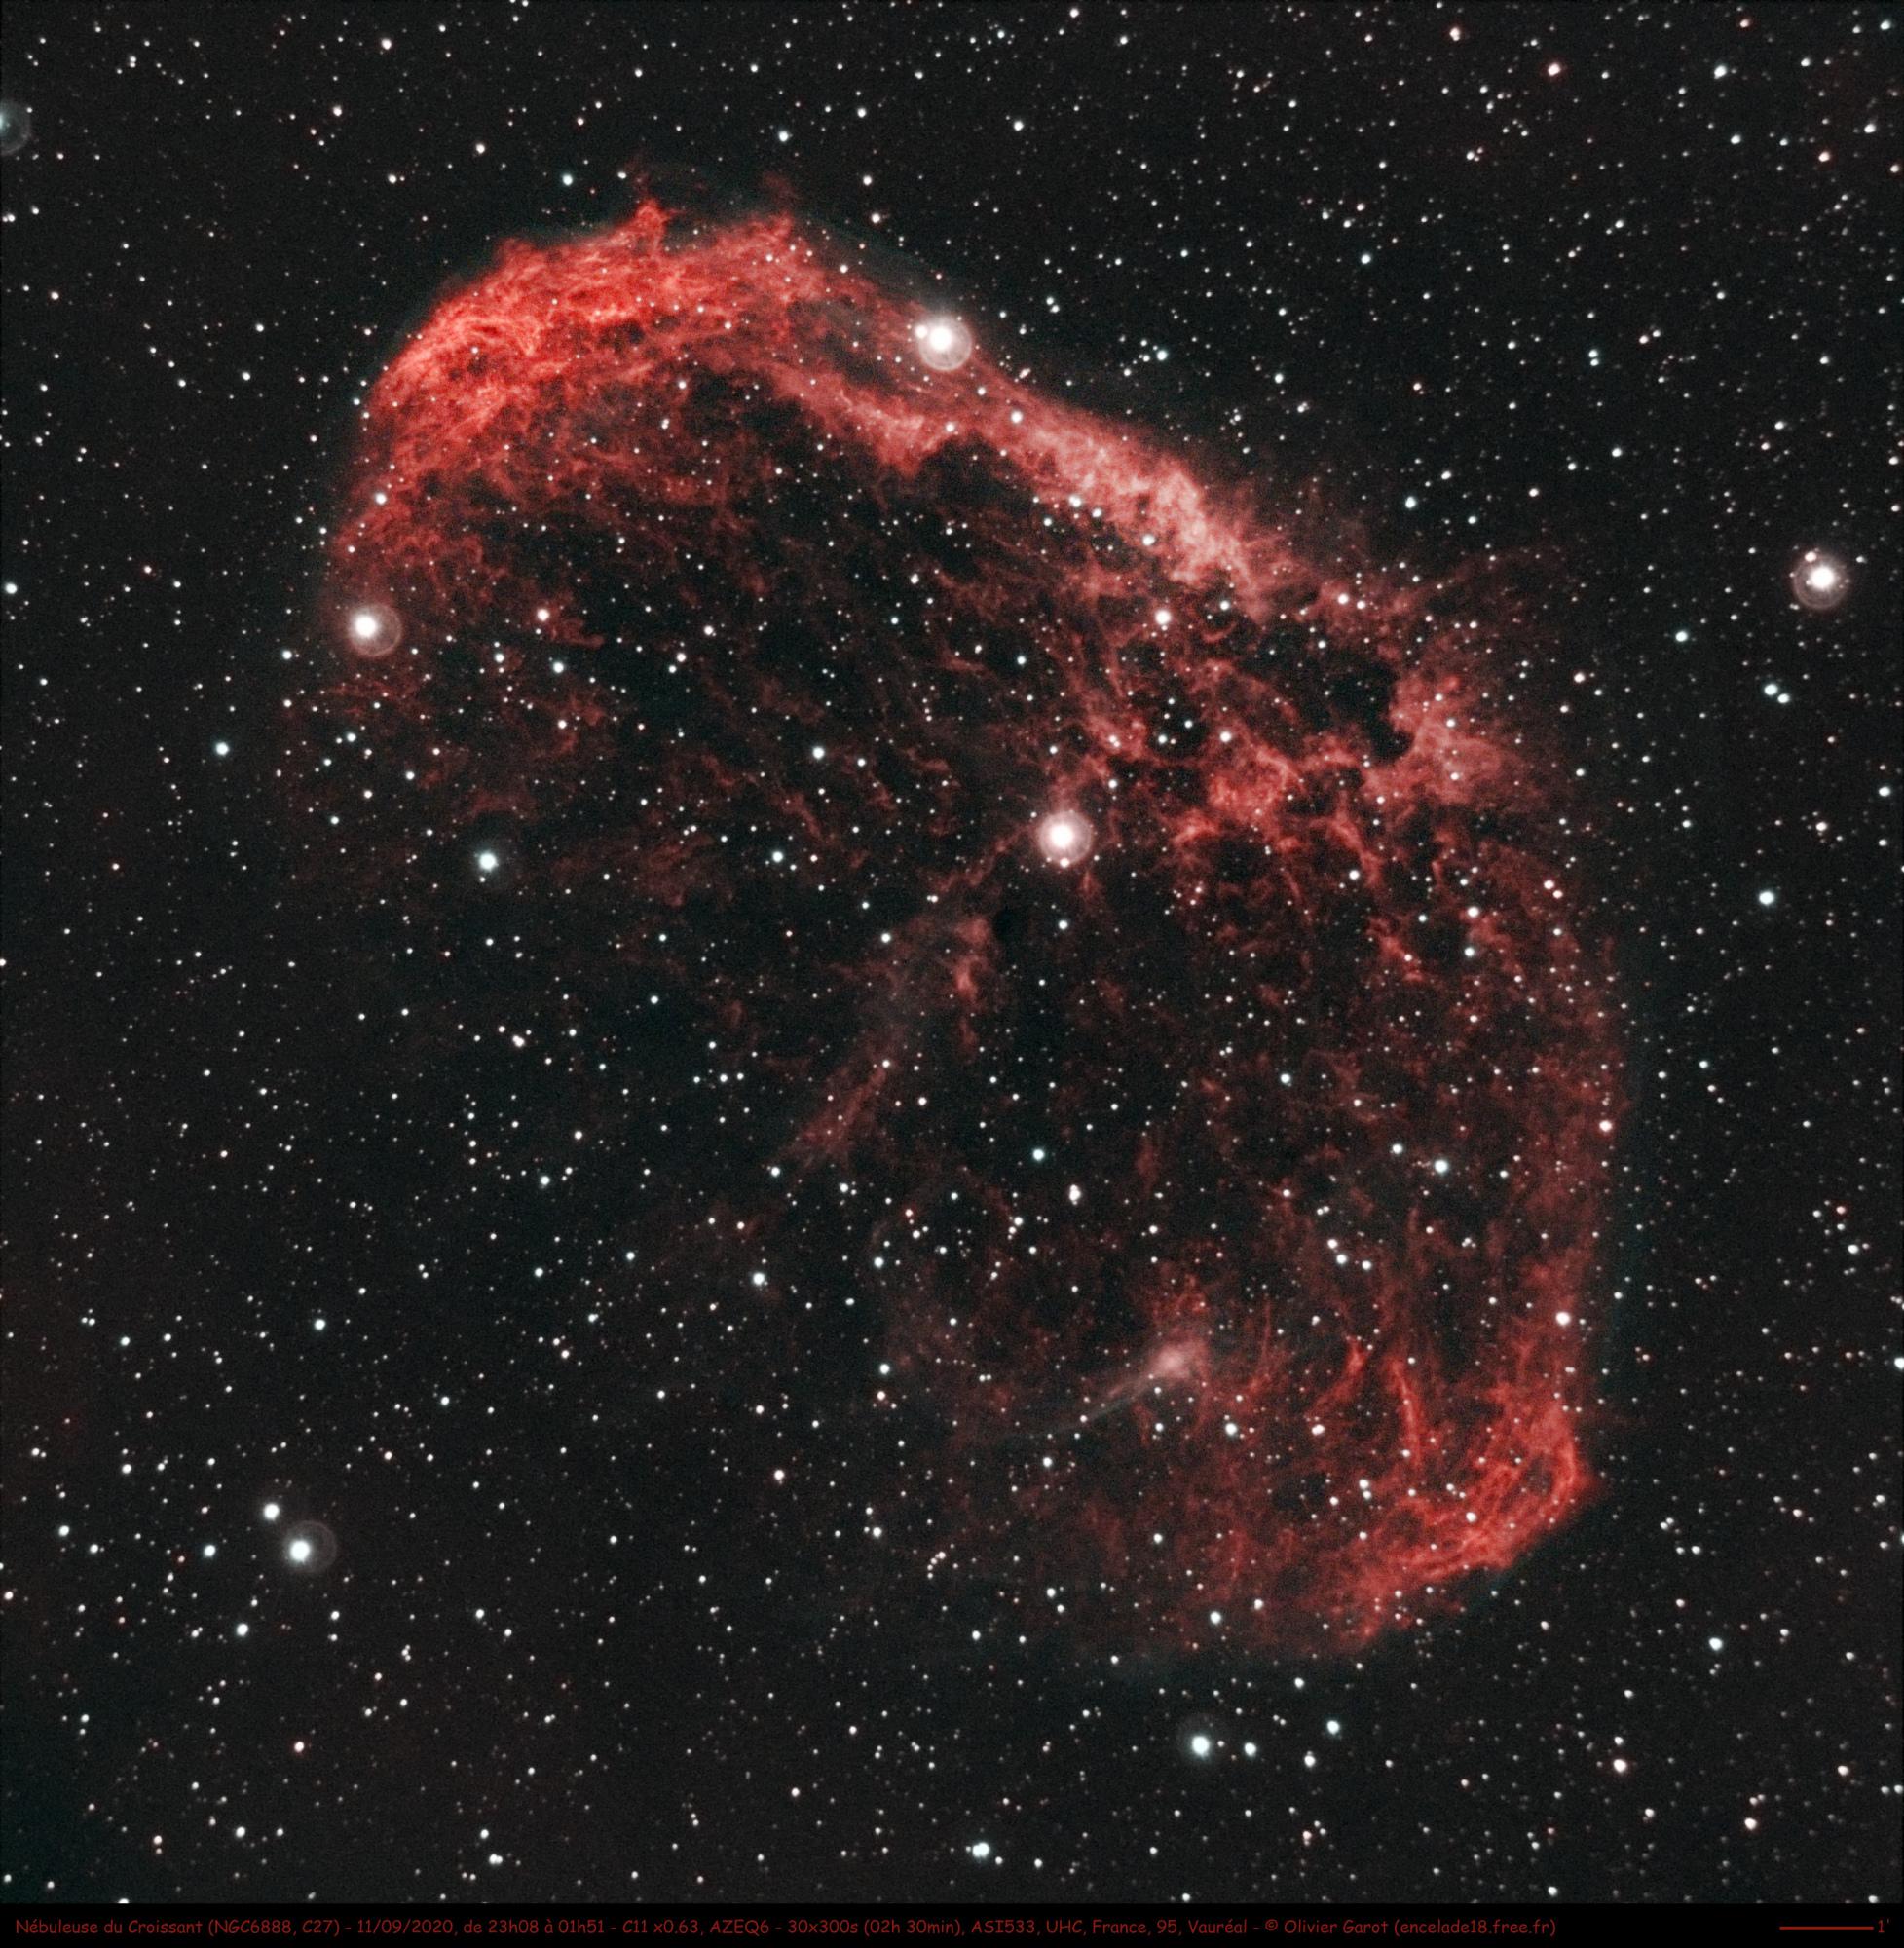 NGC6888_2020_09_11_SSFW_DOF_30im300s_c_s_eG_ecp_th0_tftc2_contA_RB_rbm_nivGA_fph3_MFb03_sat_og.thumb.jpg.fb93fd6d9e689b7e10dc13289283fa85.jpg